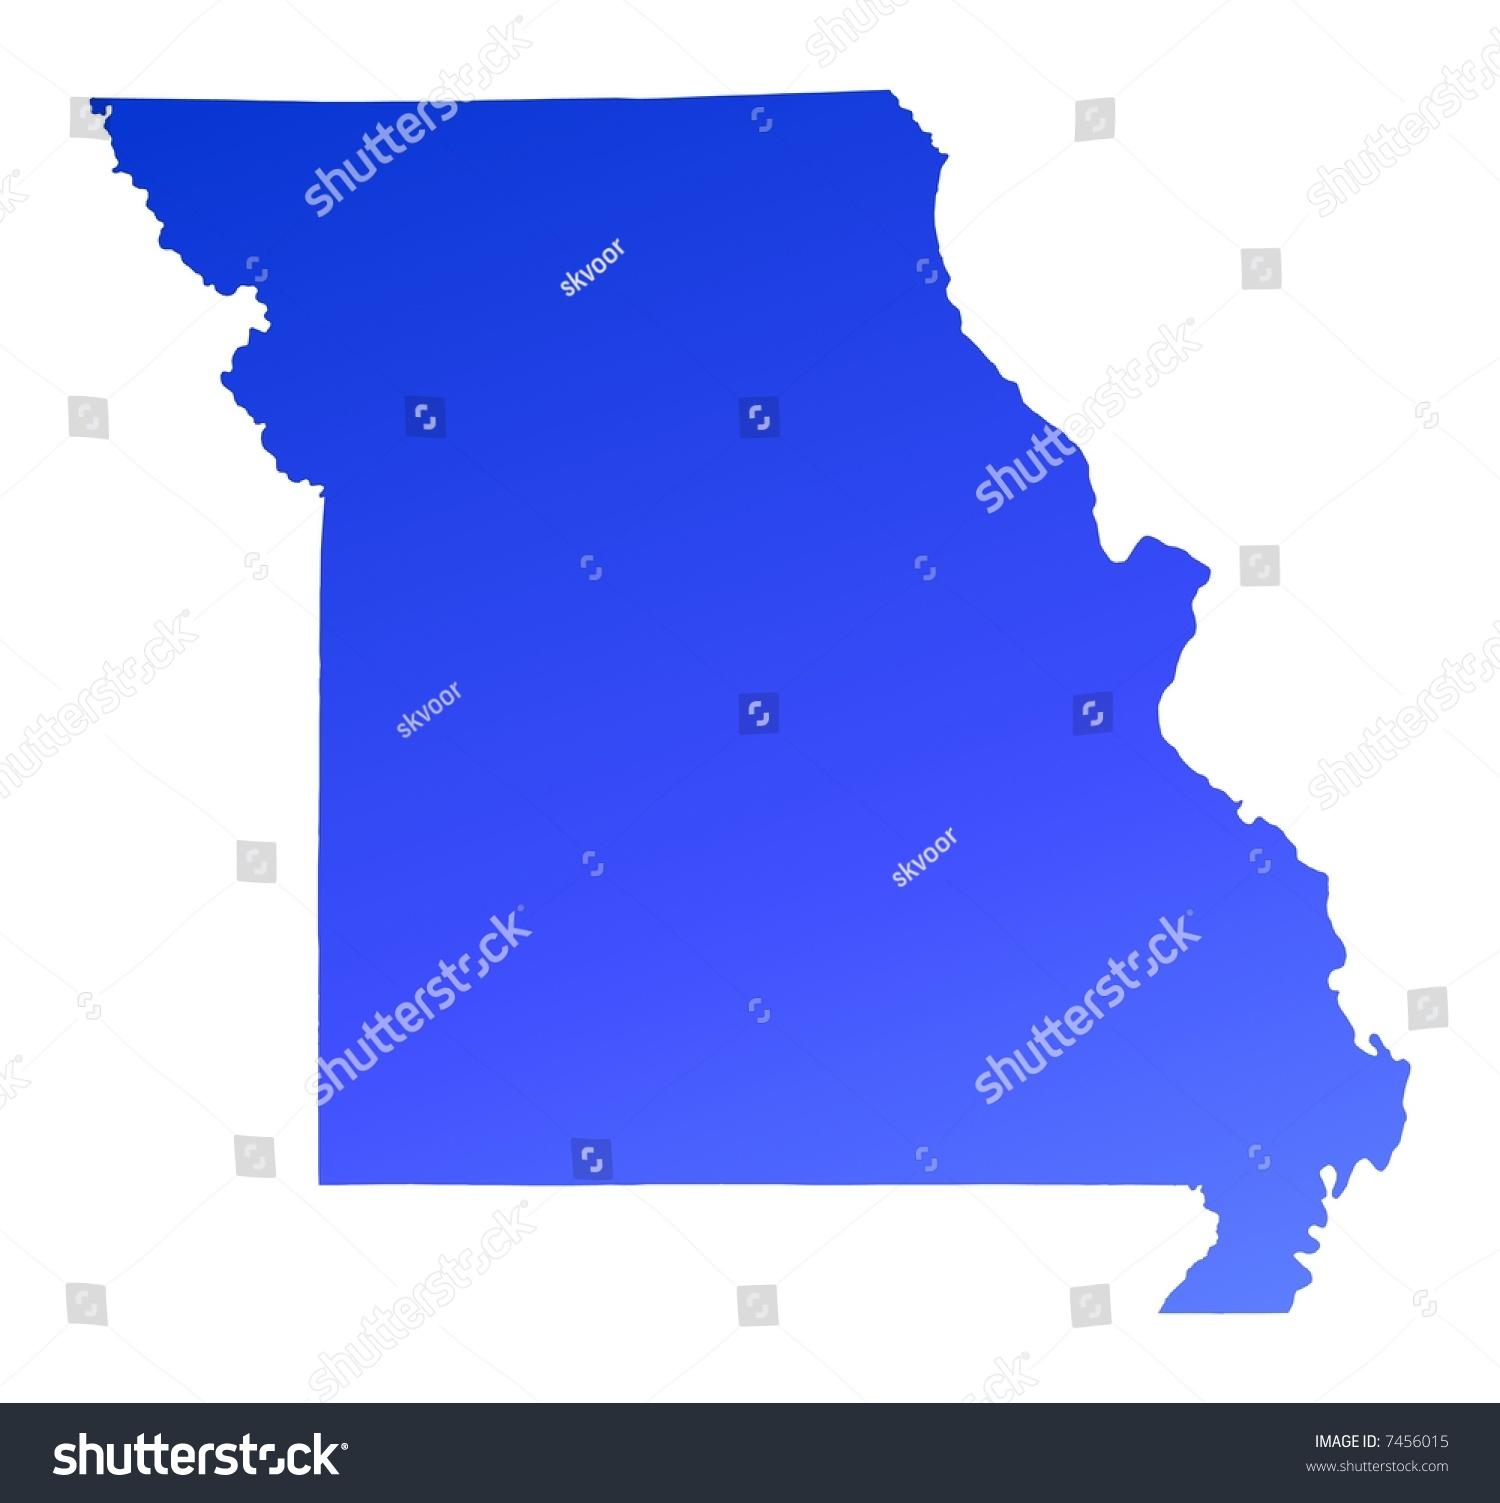 Blue Gradient Missouri Map Usa Detailed Stock Illustration 7456015